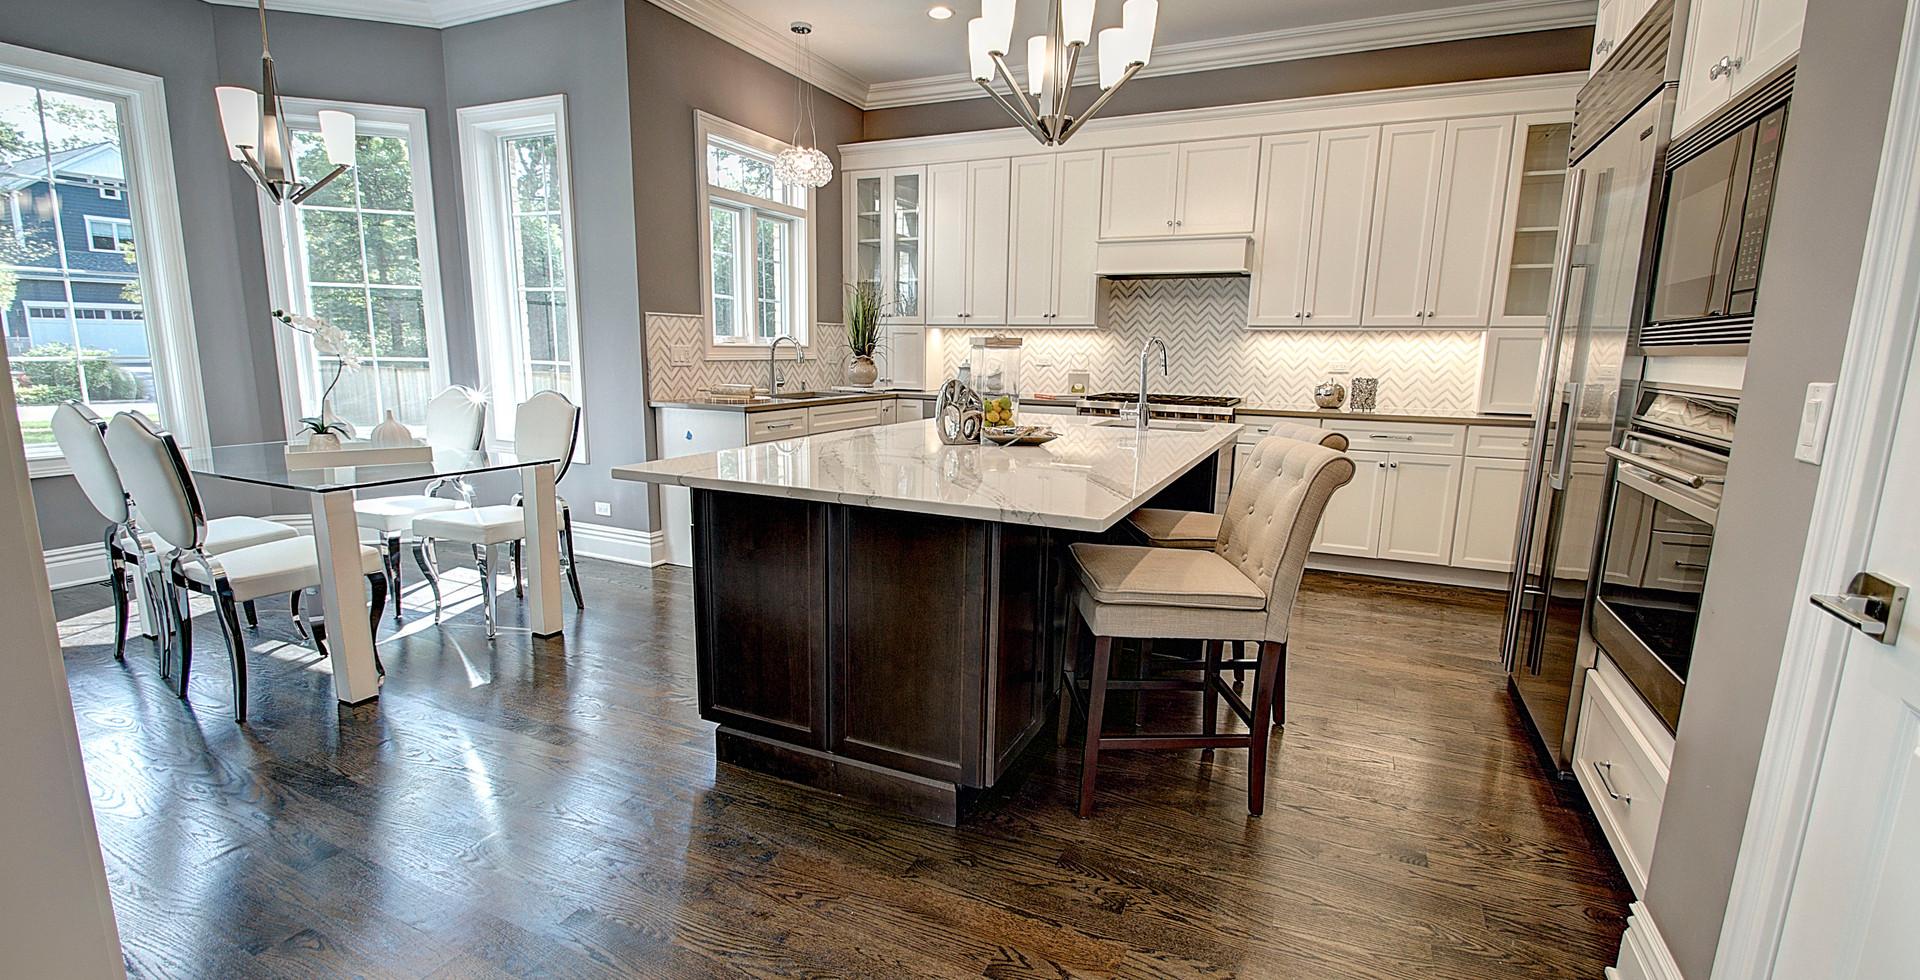 Kitchen in Naperville designed by MRM Home Design.jpg